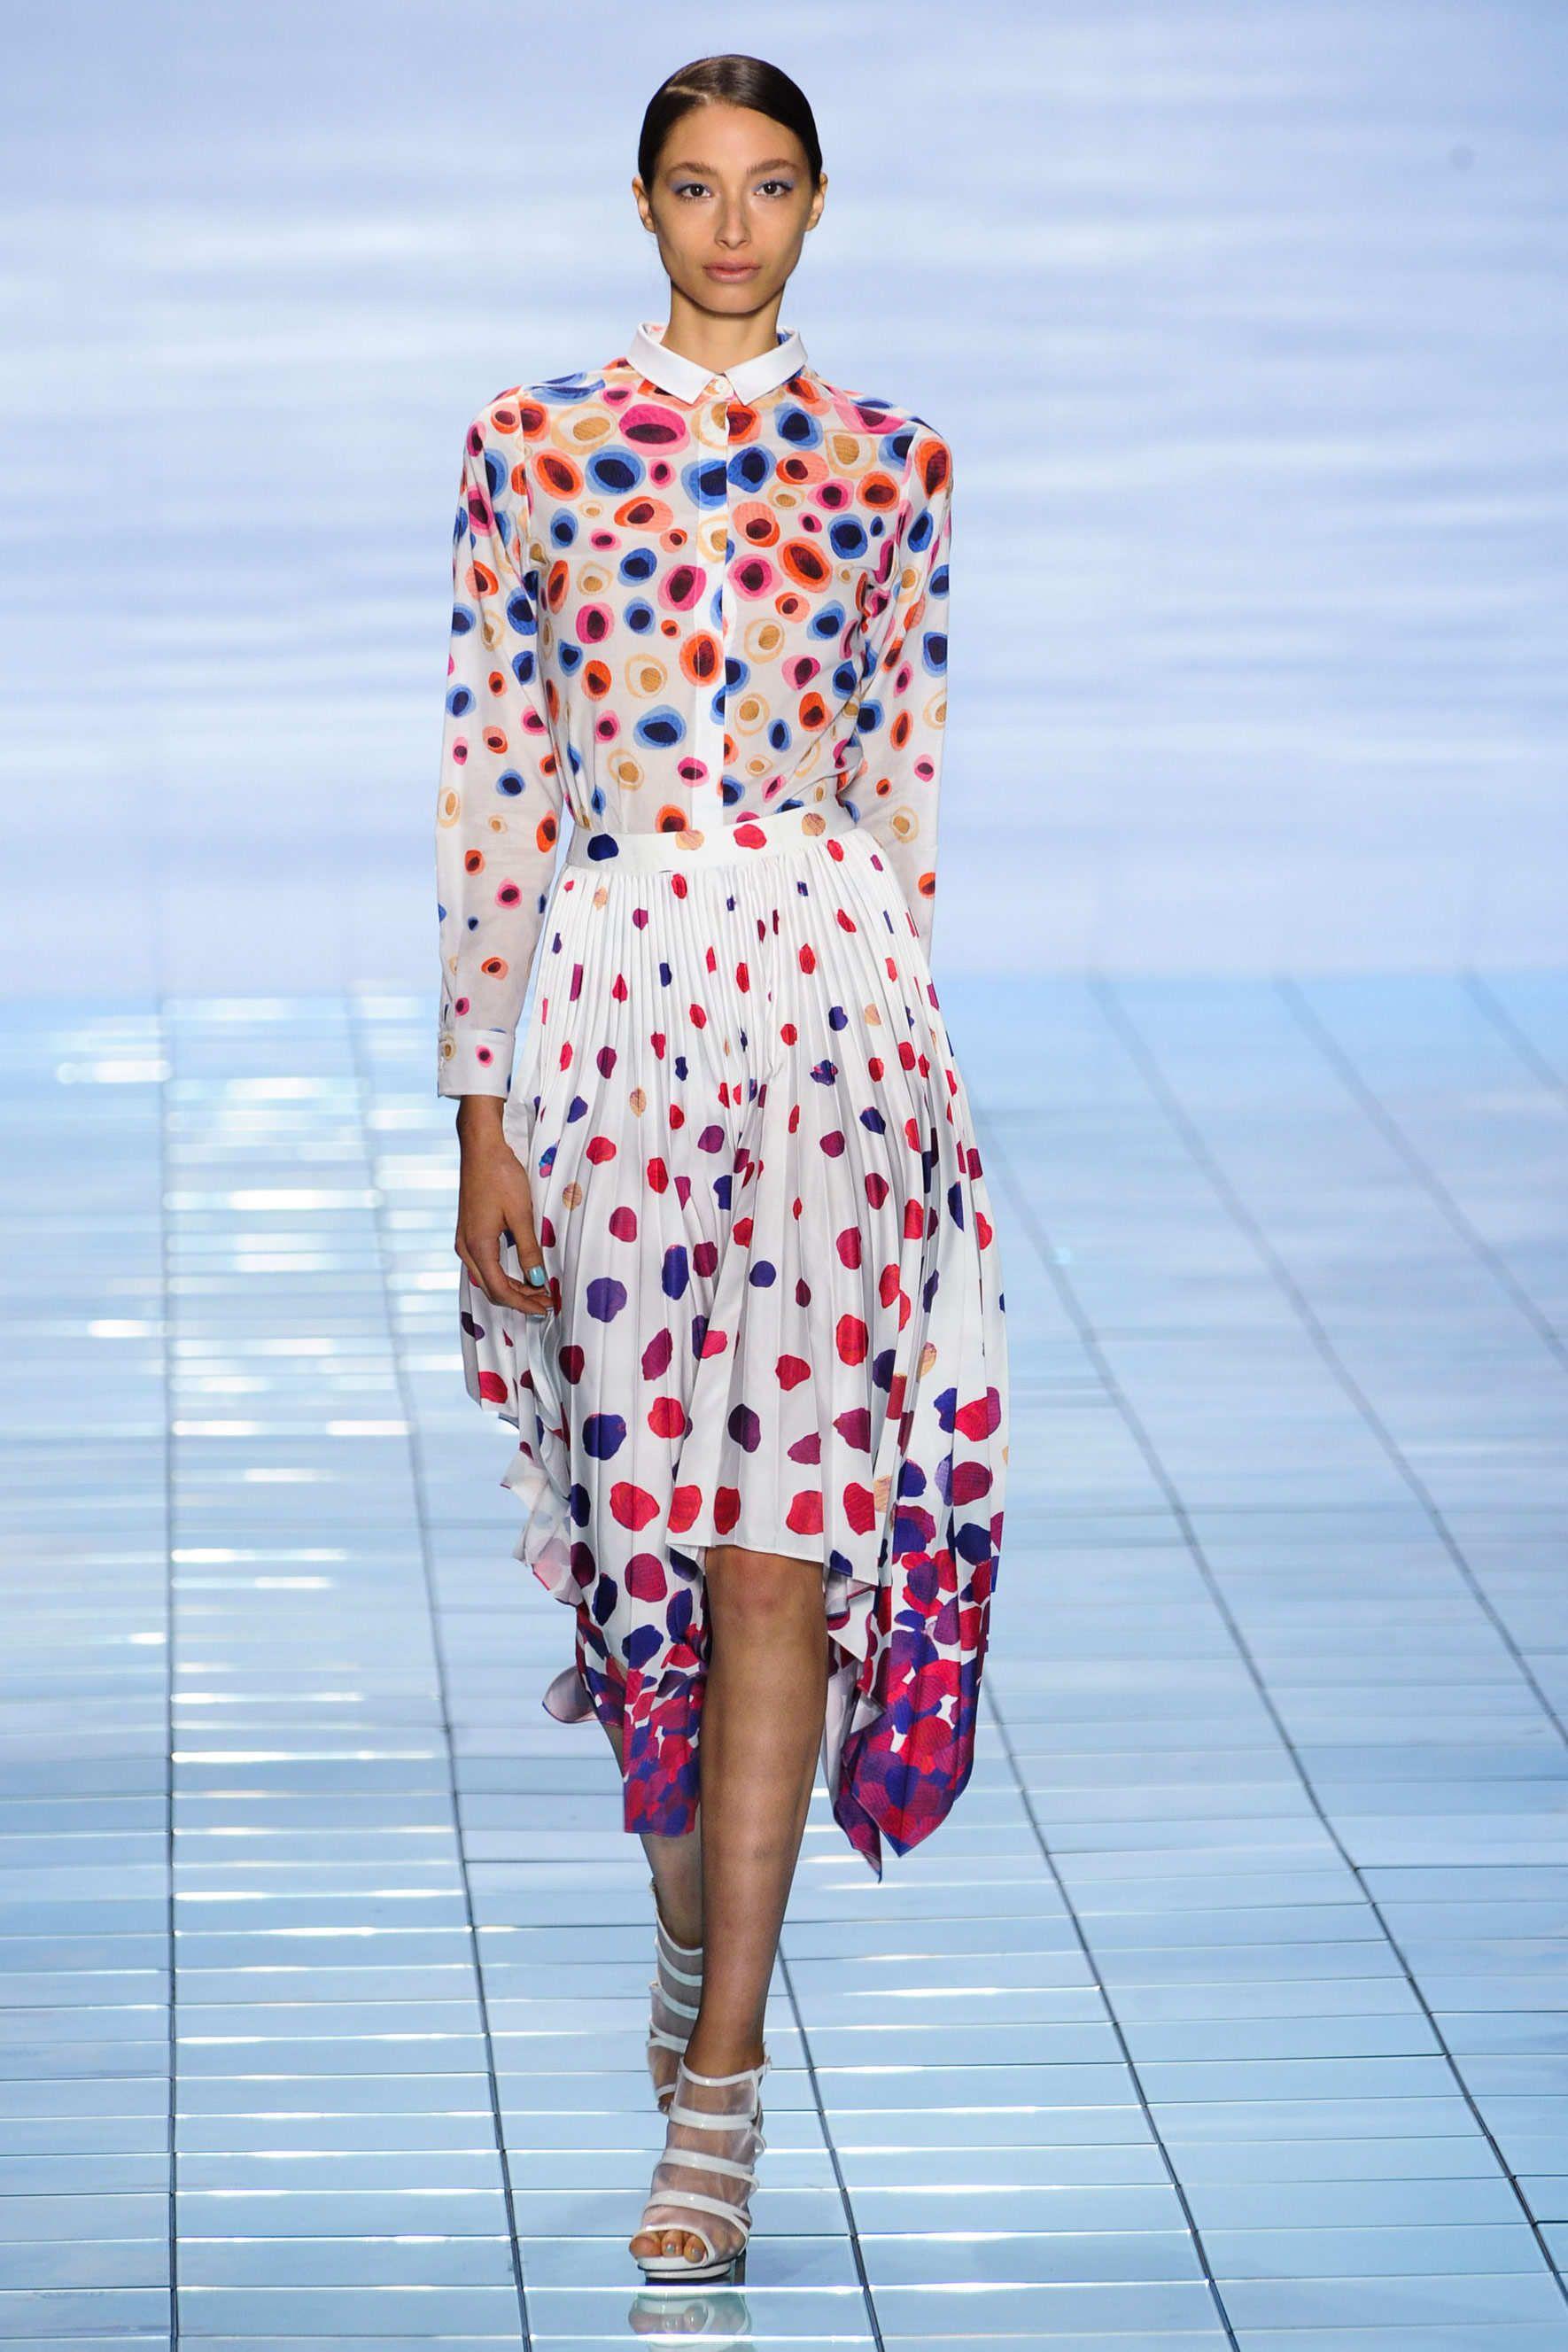 Instagrams modelstalking from paris fashion week